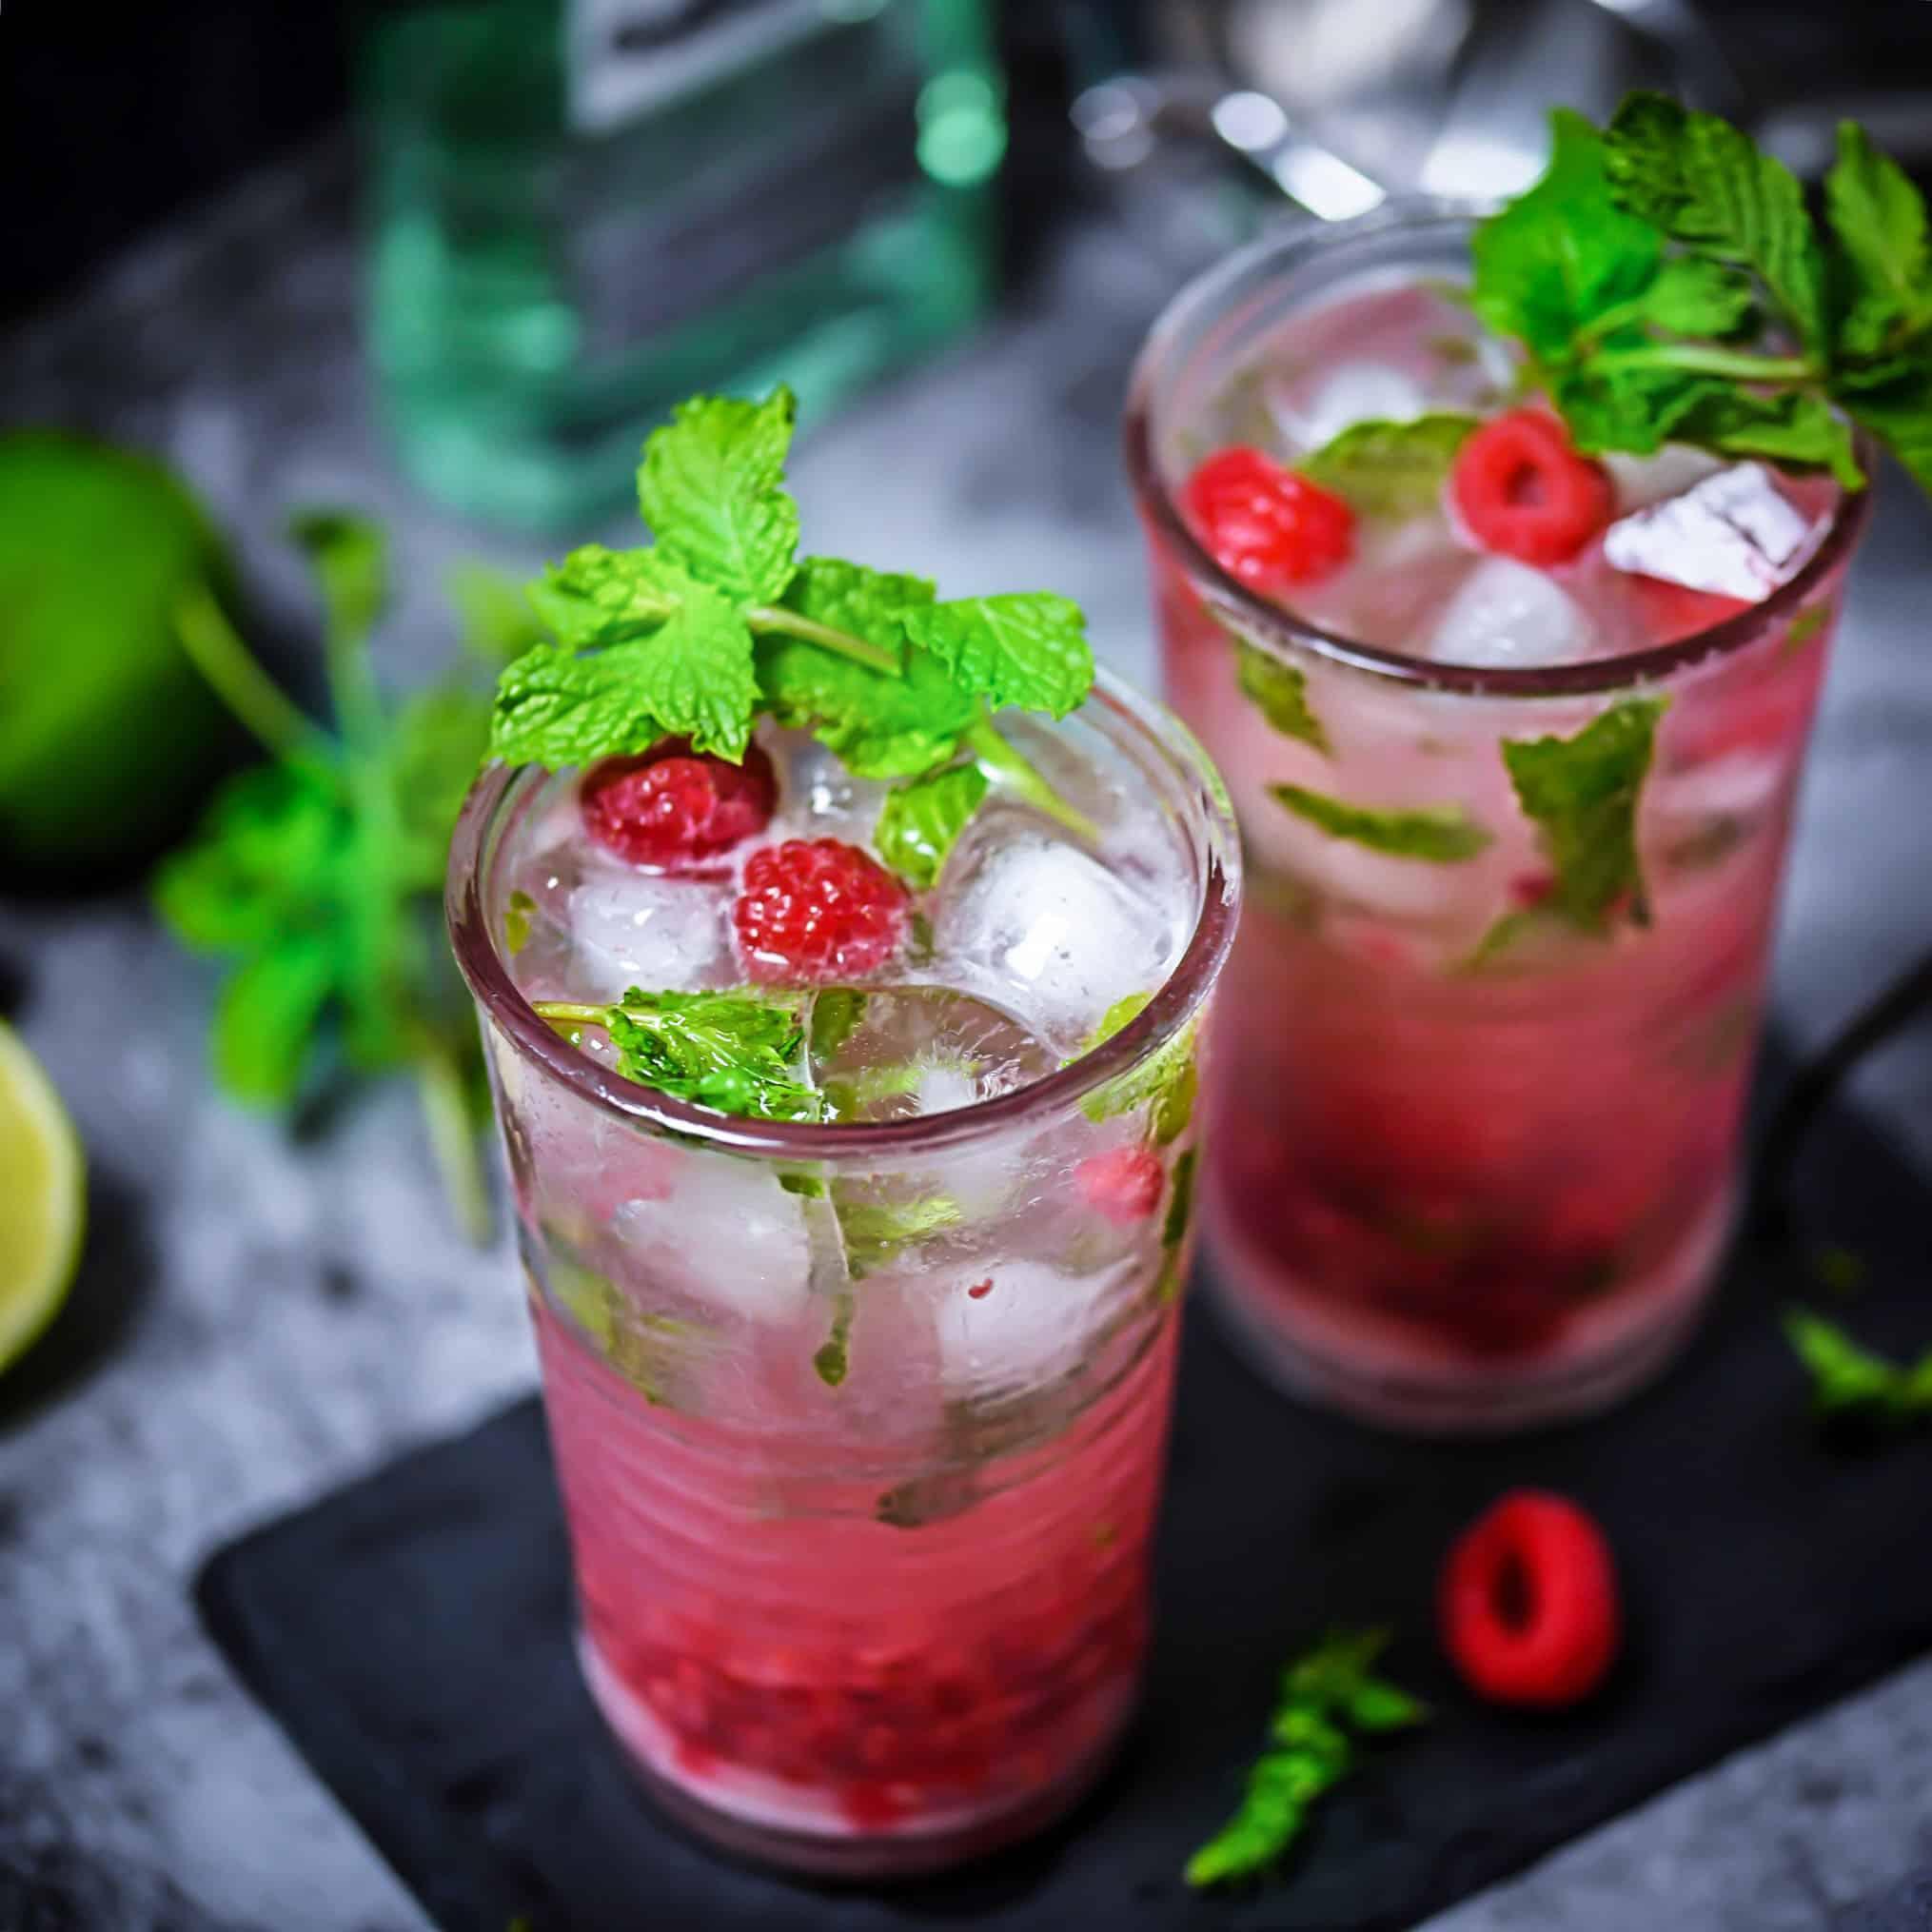 Mojito Cocktails with garnish